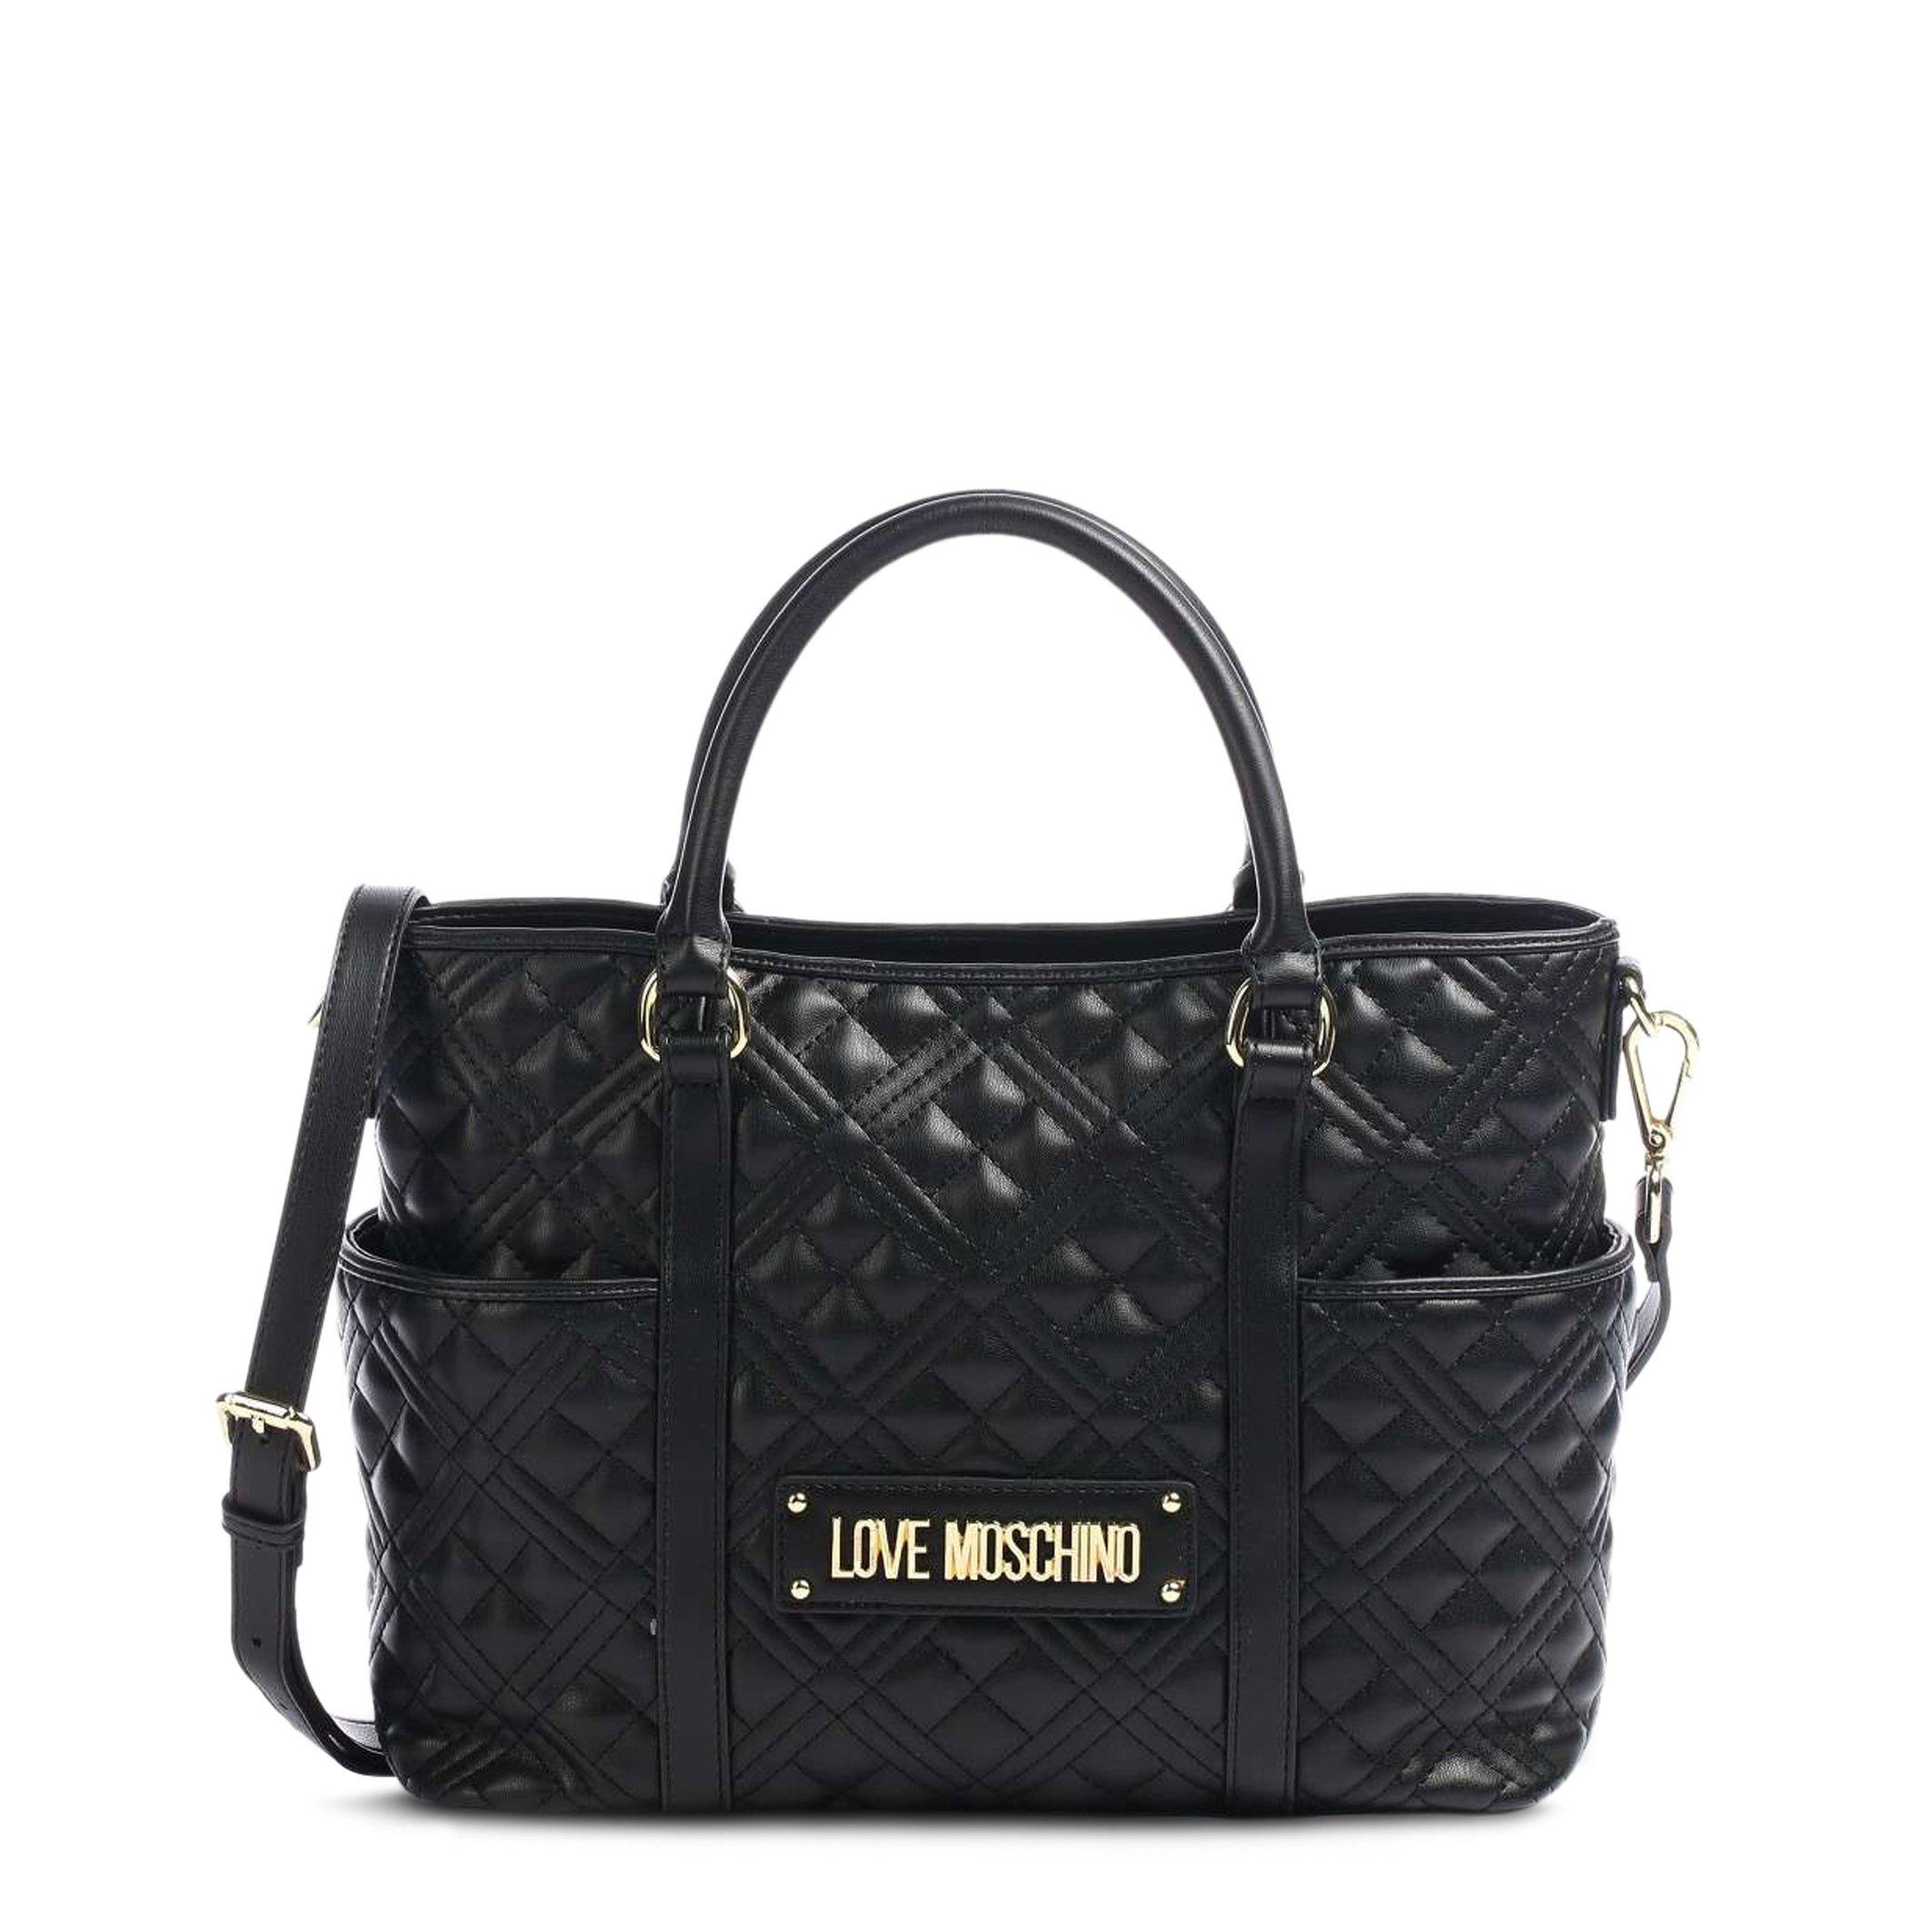 Love Moschino Women's Handbag Various Colours JC4203PP0CKA0 - black NOSIZE